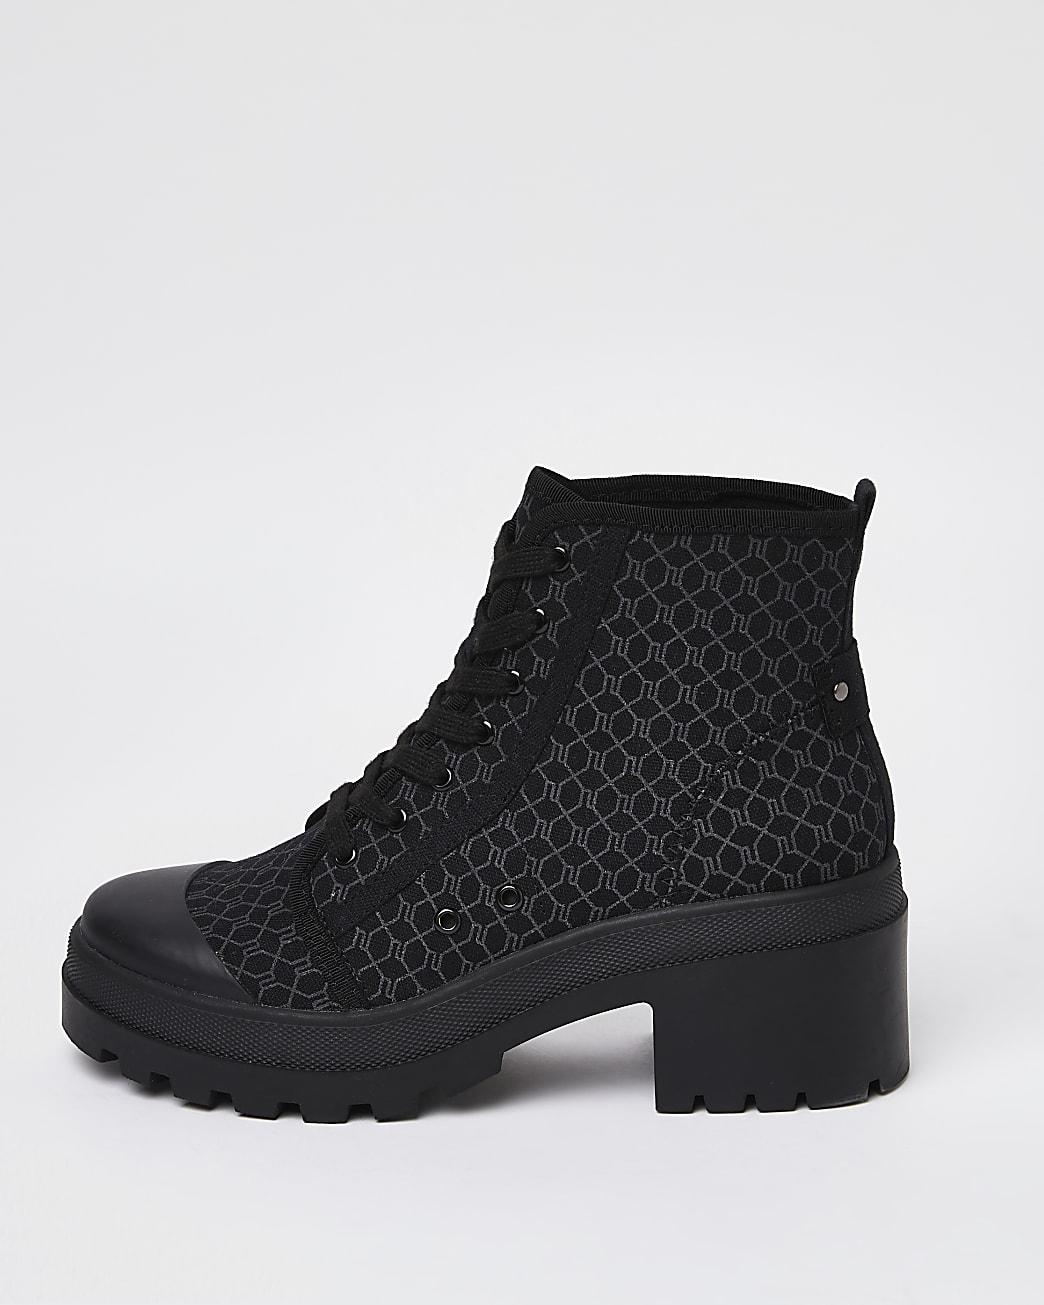 Black RI monogram lace up ankle boots